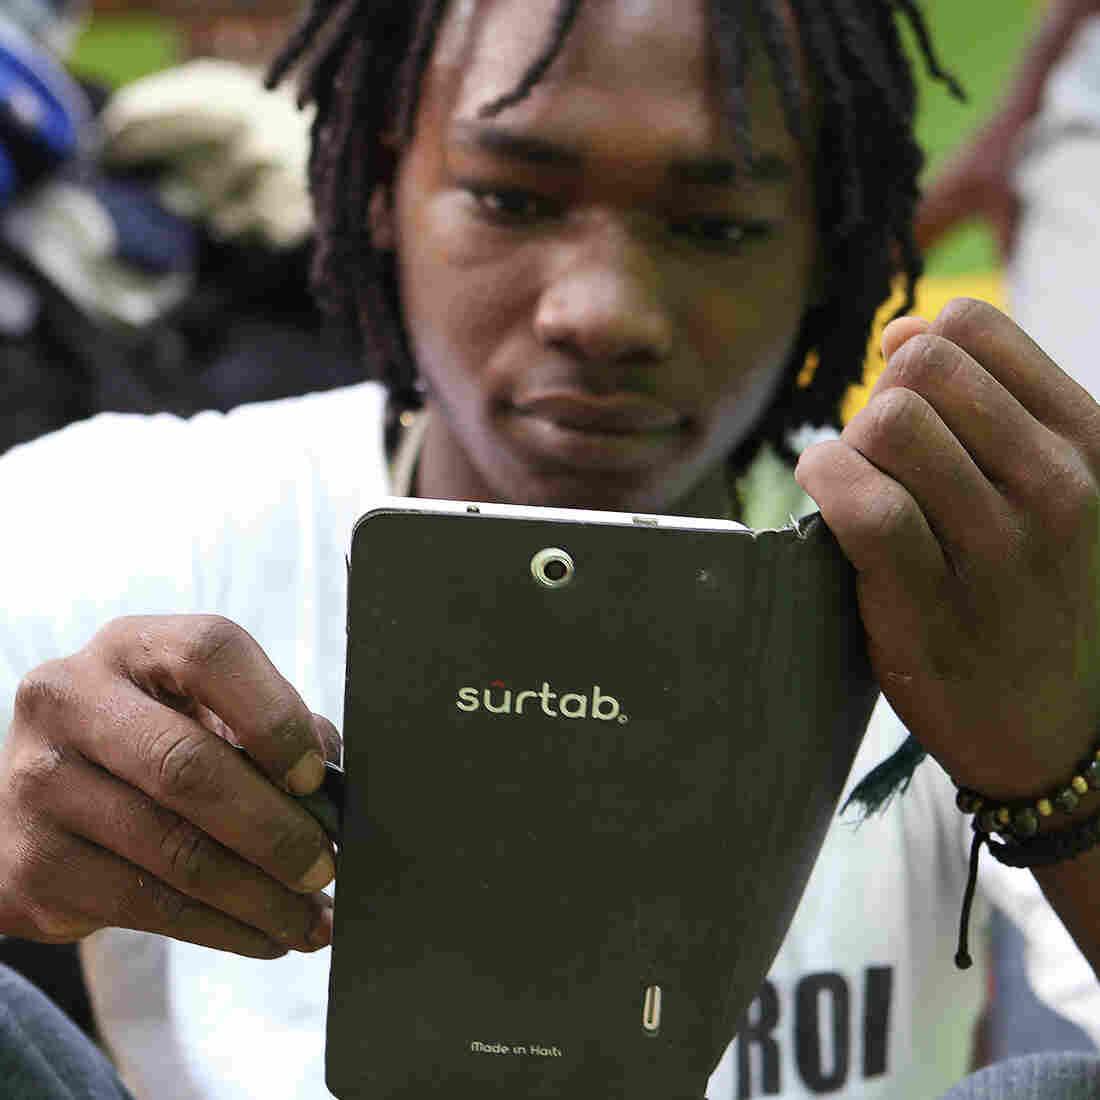 A Small Tablet Company Brings High-Tech Hopes To Haiti